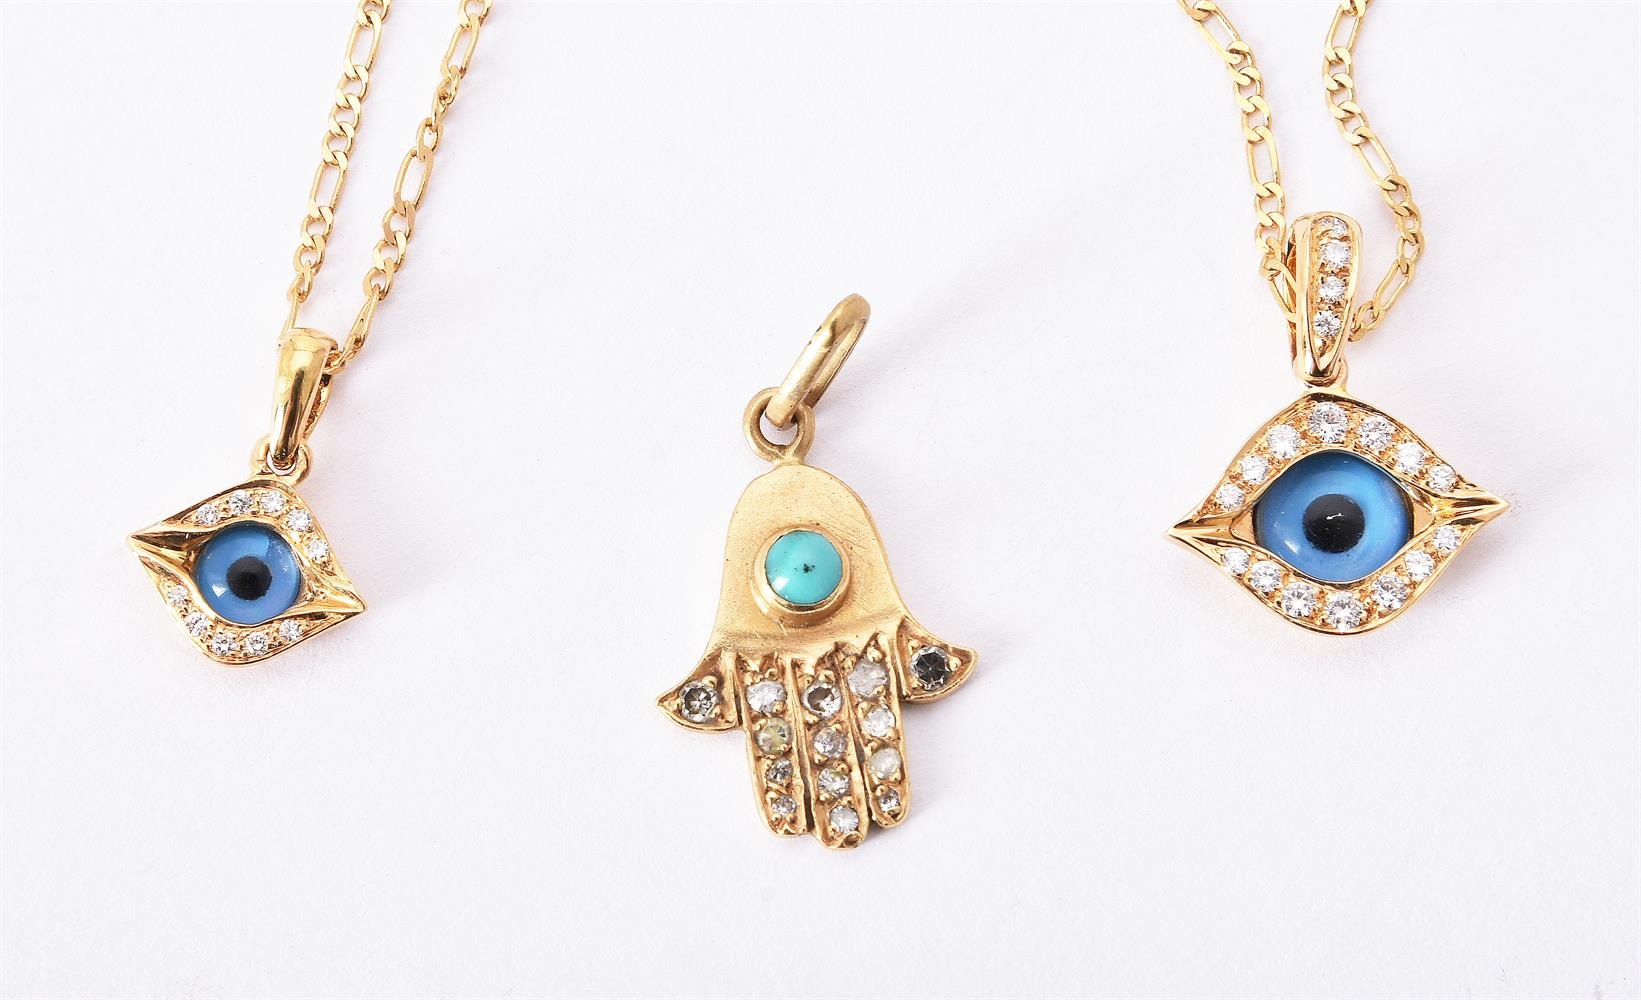 Two eye amulet pendants by Mouawad